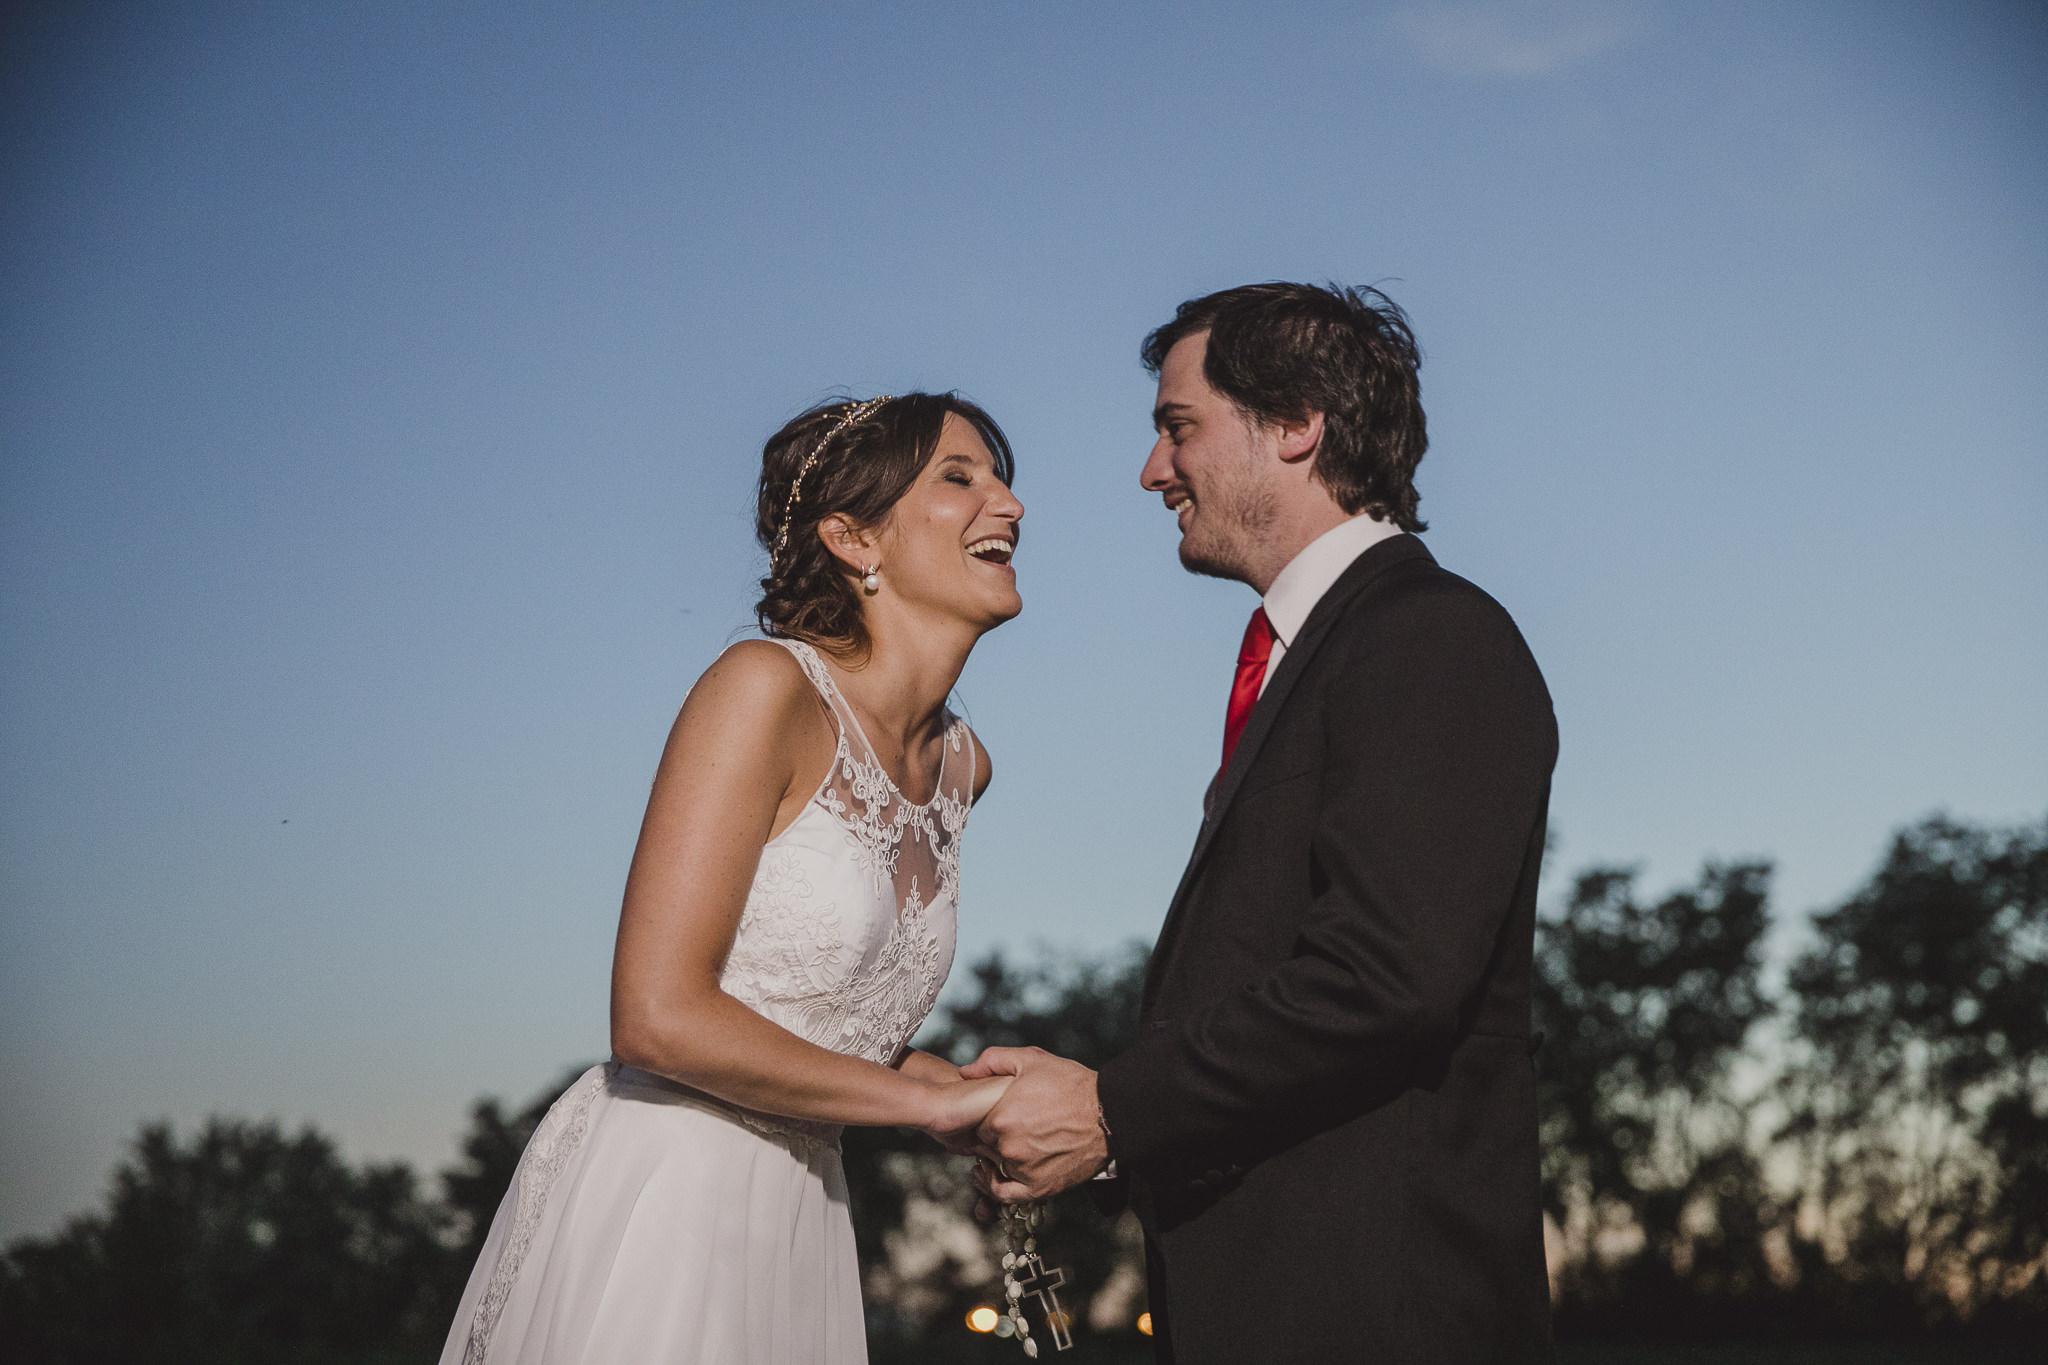 boda en lacrosse - fotografía espontánea de bodas - fotos de boda uruguay - P&I01